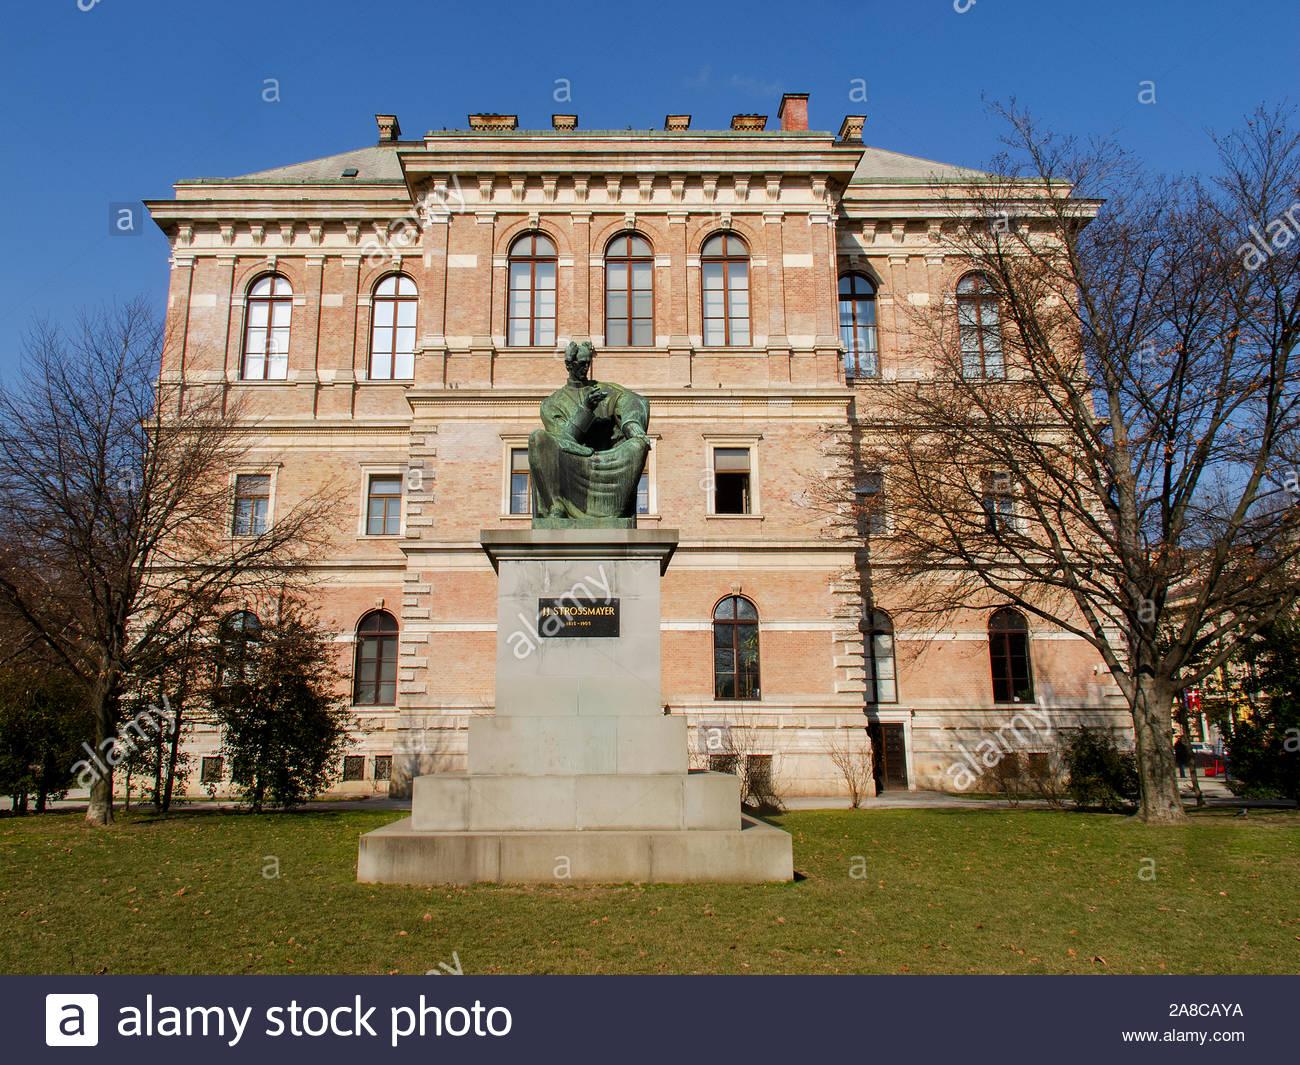 ZAGREB, CROATIA - FEBRUARY 2015 Statue of Josip Juraj Strossmayer in front of the Croatian Academy of Science and Arts 8045 Stock Photo